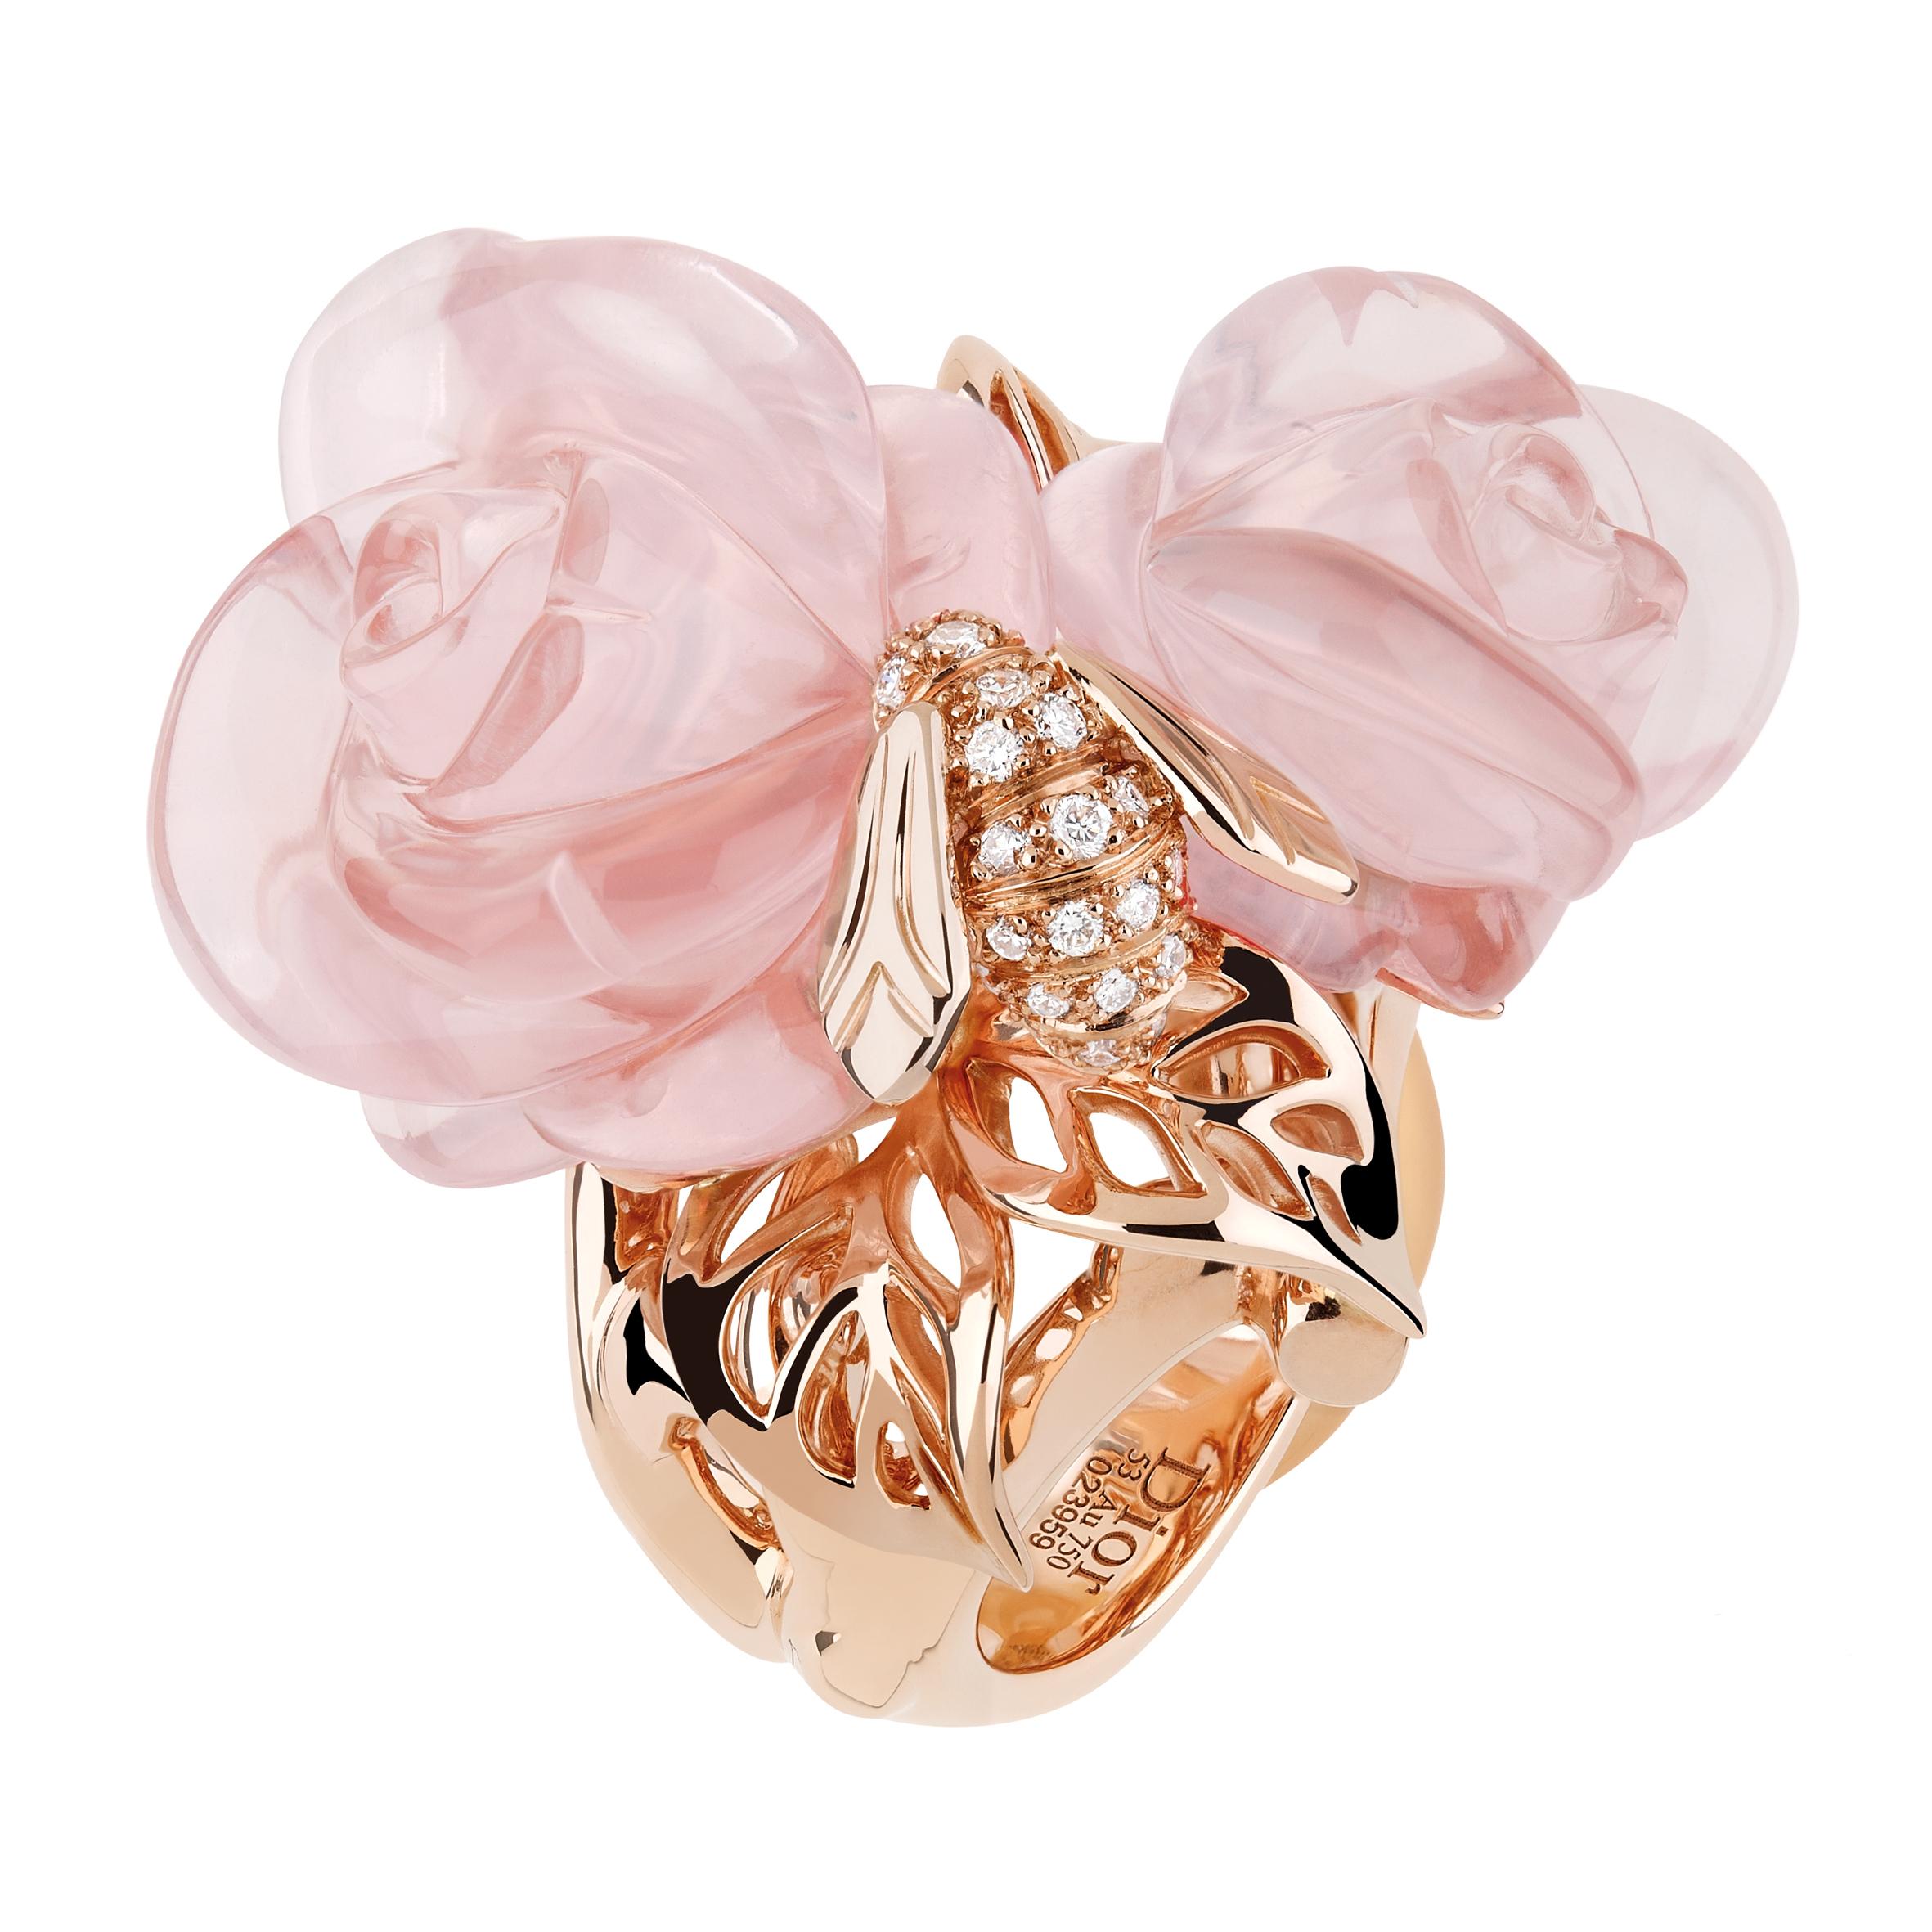 bague rose dior pr catelan quartz rose gm luxsure. Black Bedroom Furniture Sets. Home Design Ideas